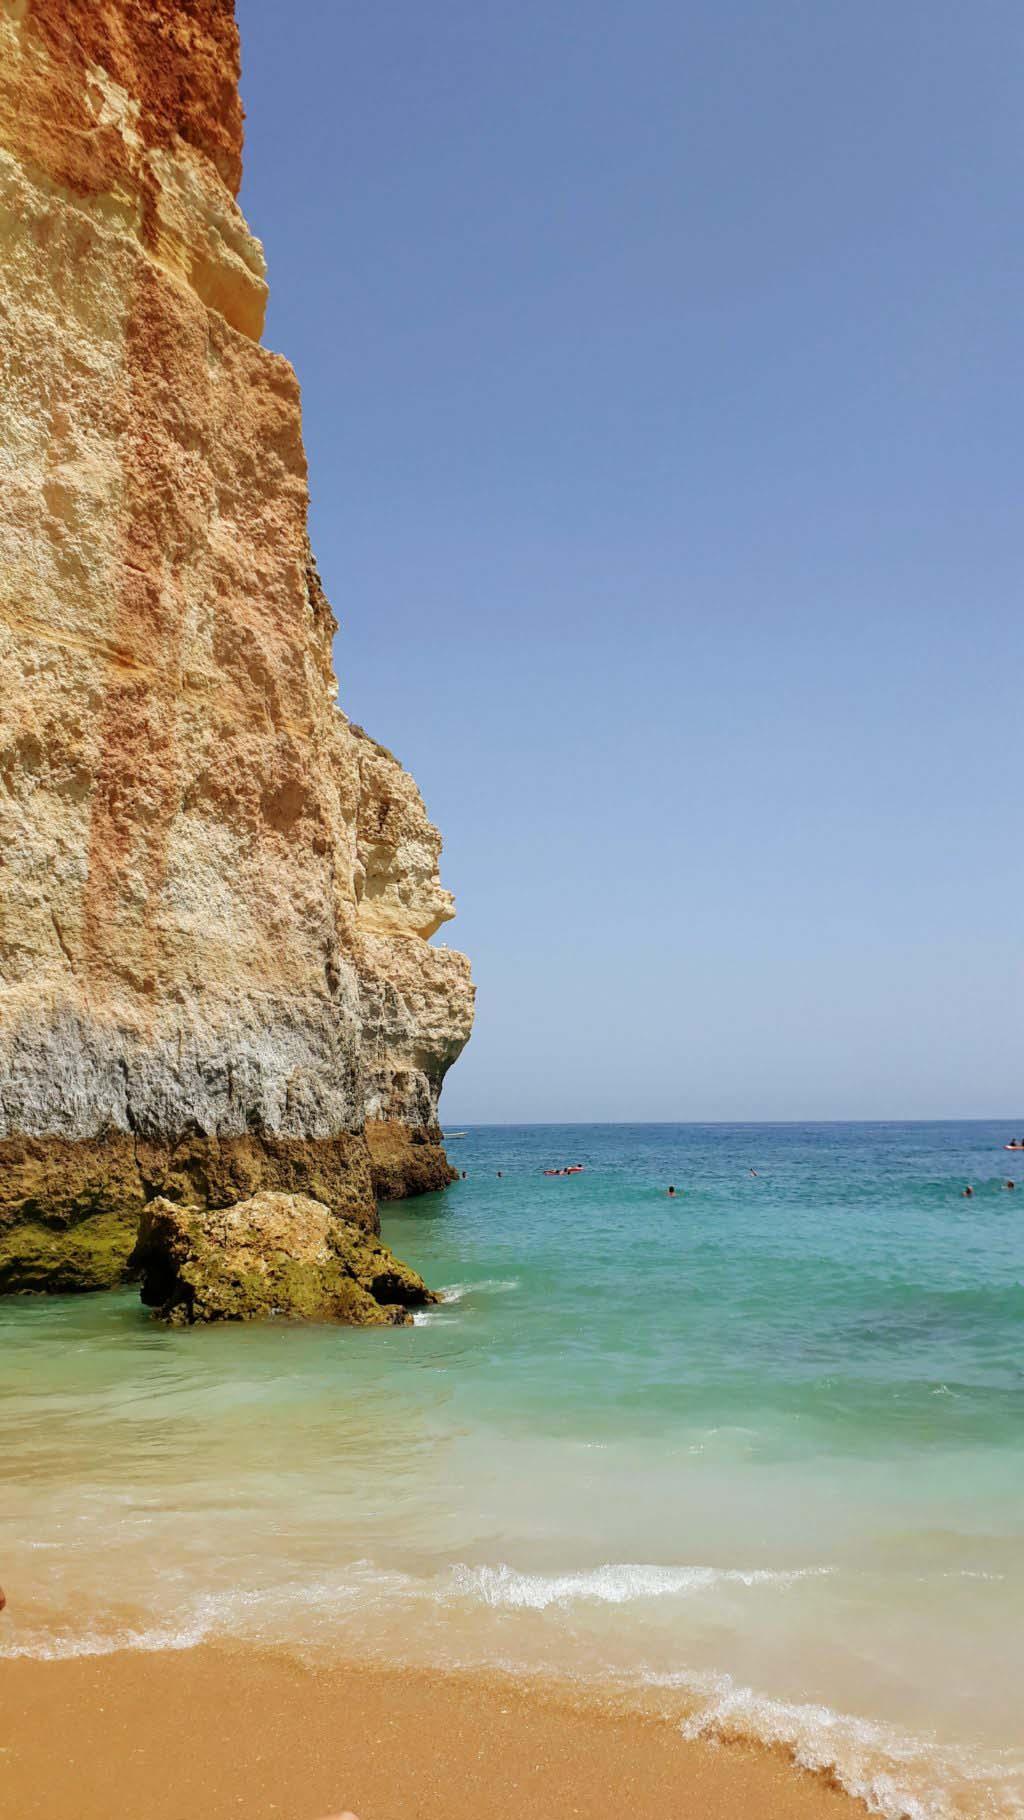 Behind this rock hides the Benagil Cave